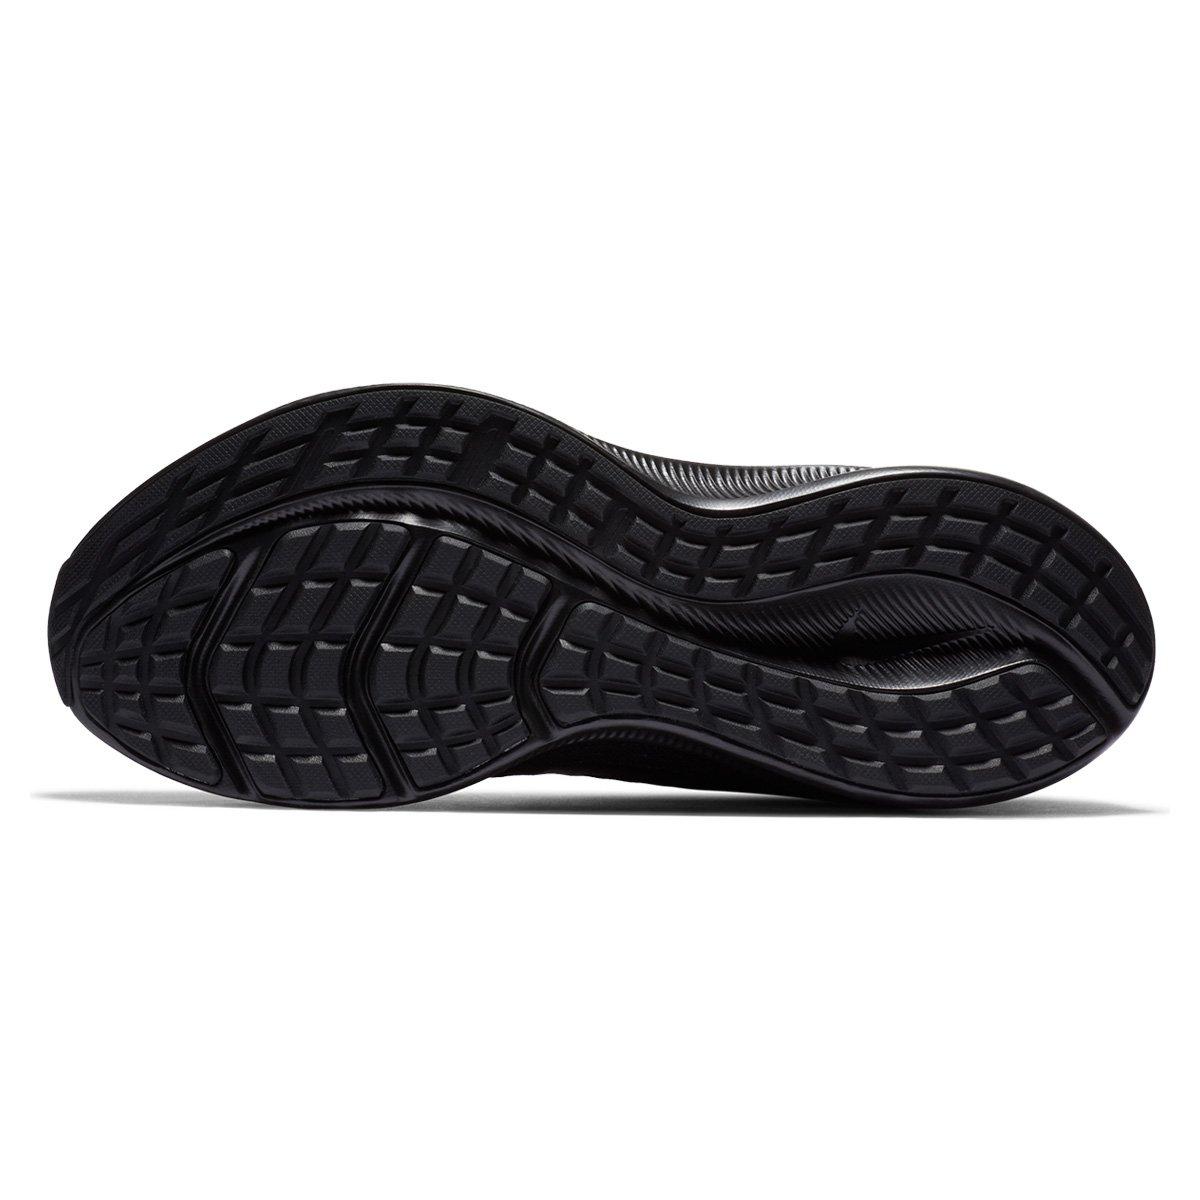 Tênis Nike Downshifter 10 Preto - Feminino